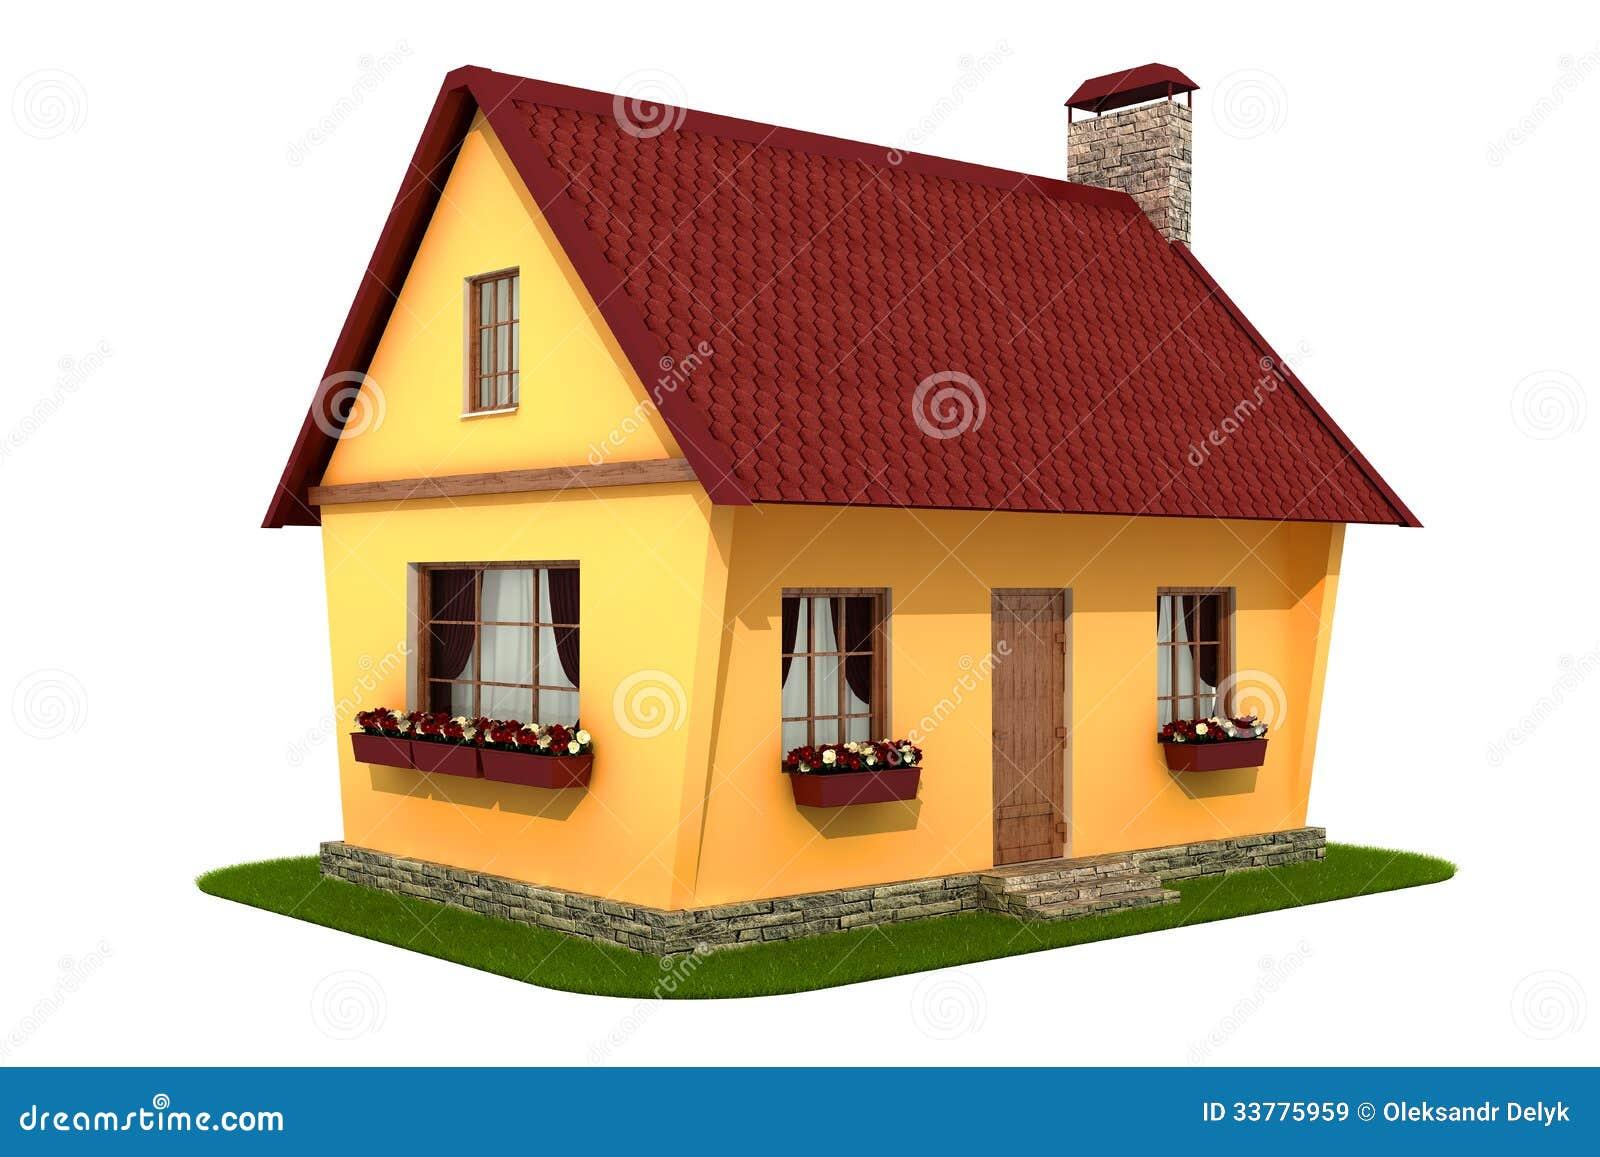 Model village house